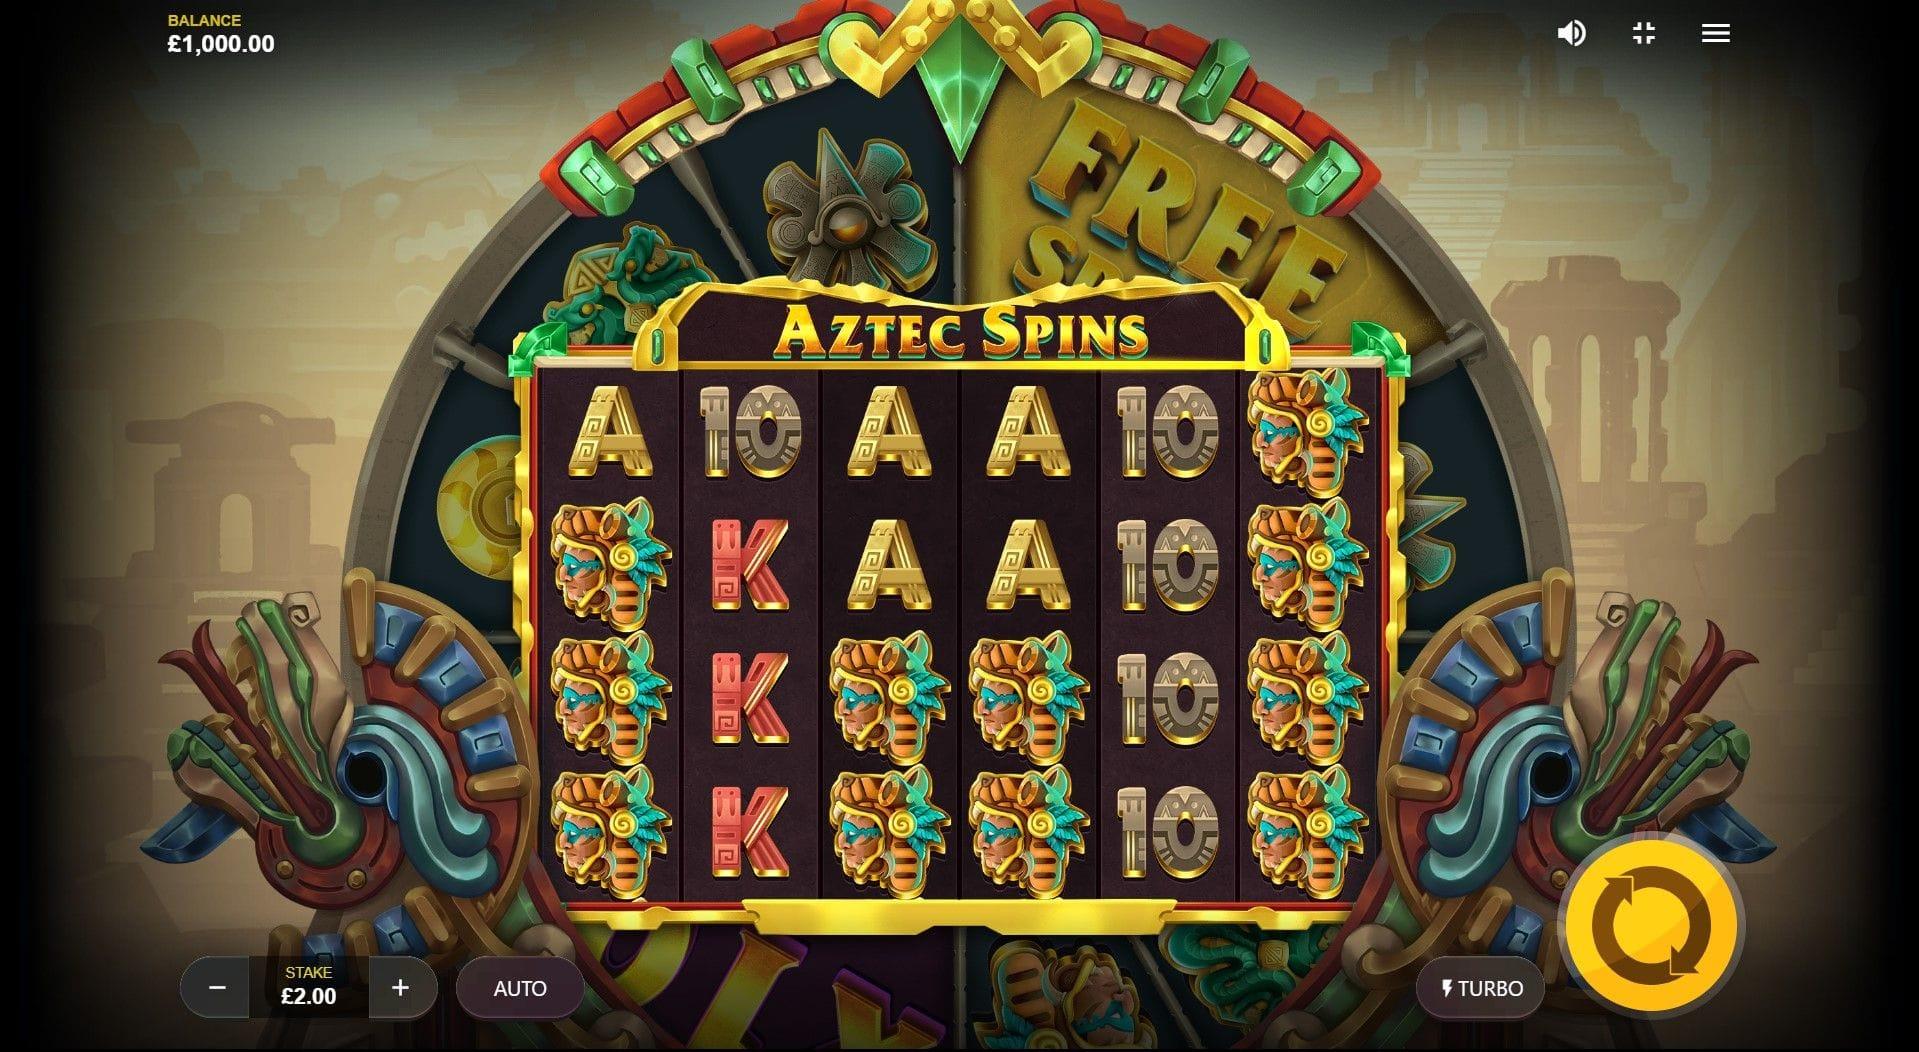 Aztec Spins Slot Game